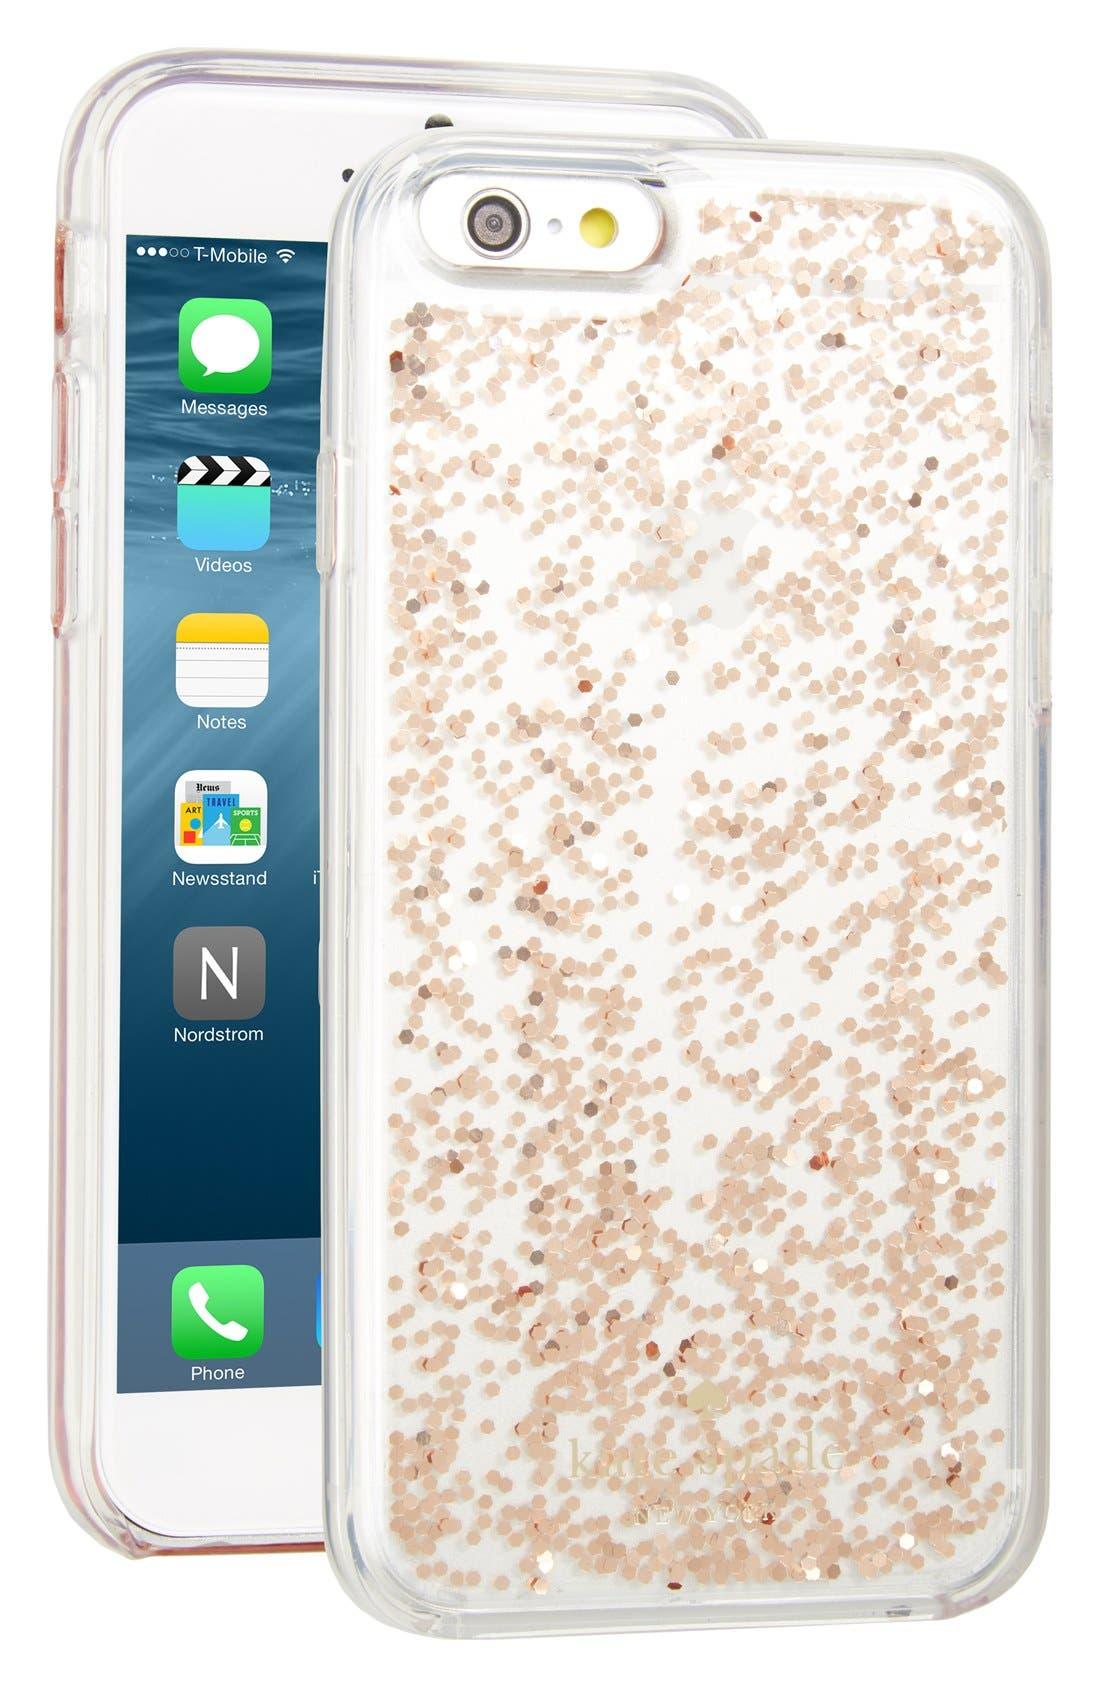 Main Image - kate spade new york glitter iPhone case (6/6s/6 Plus & 6s Plus)